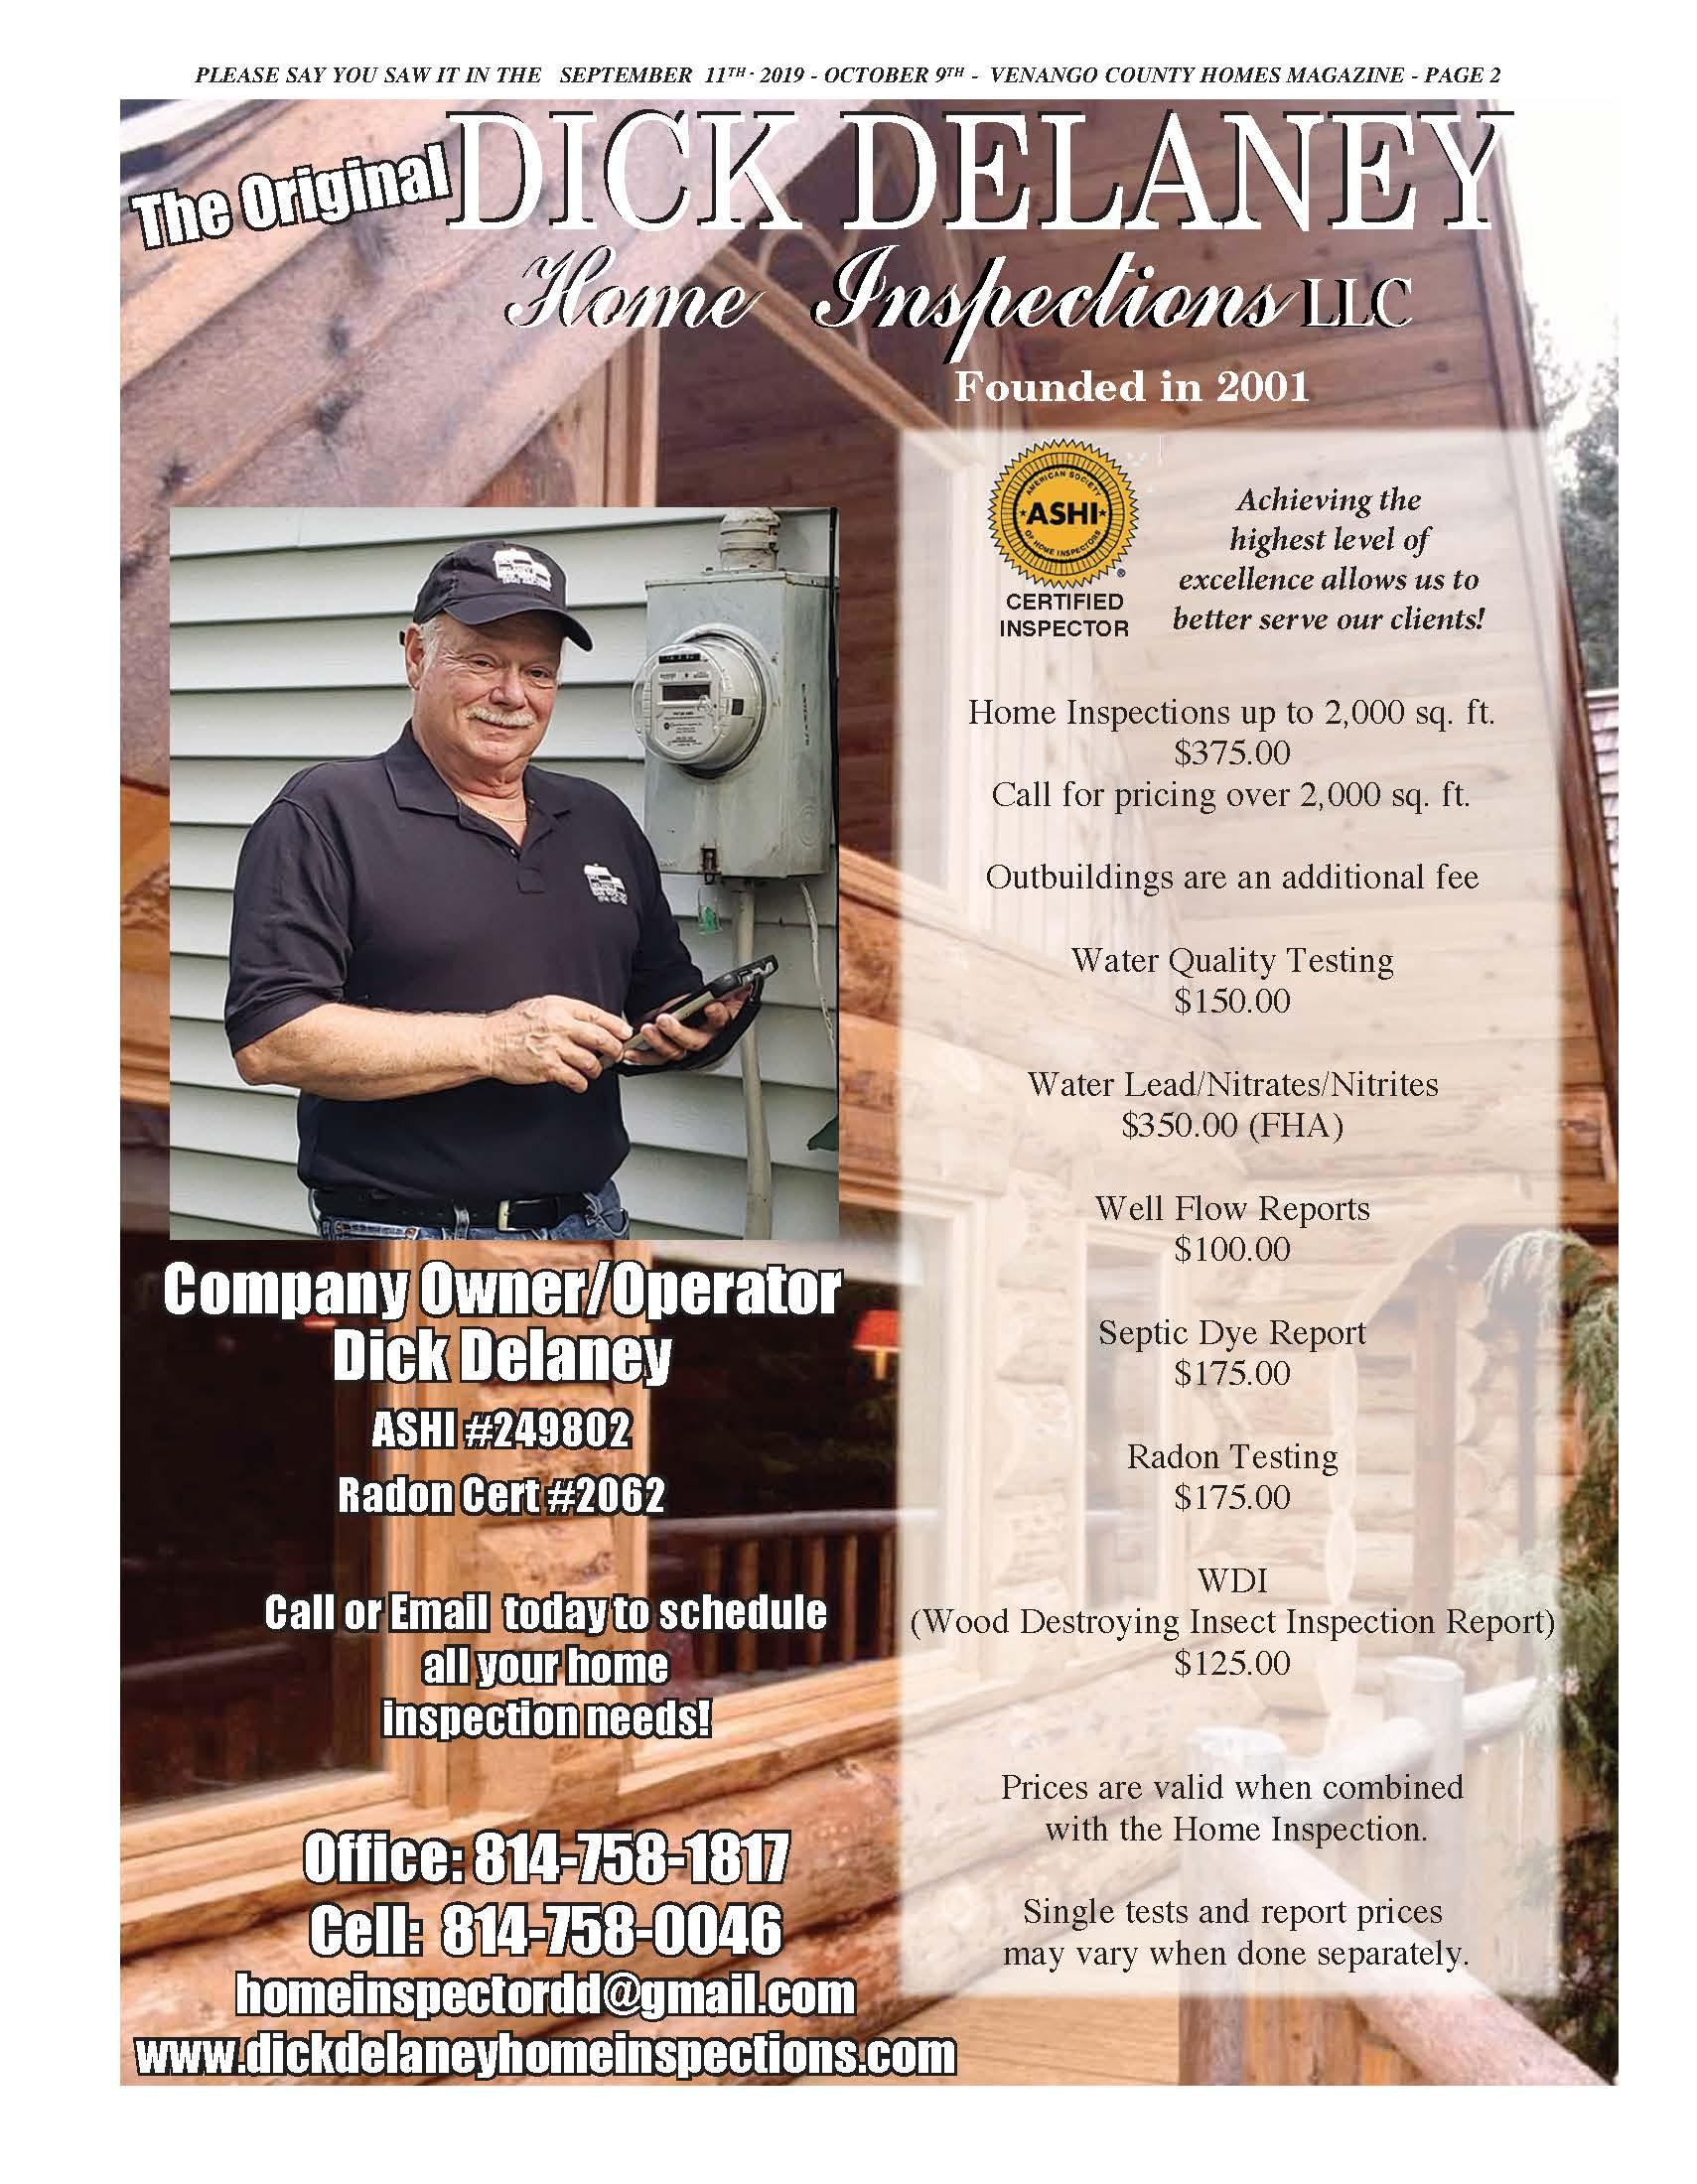 Dick Delaney Home Inspections LLC